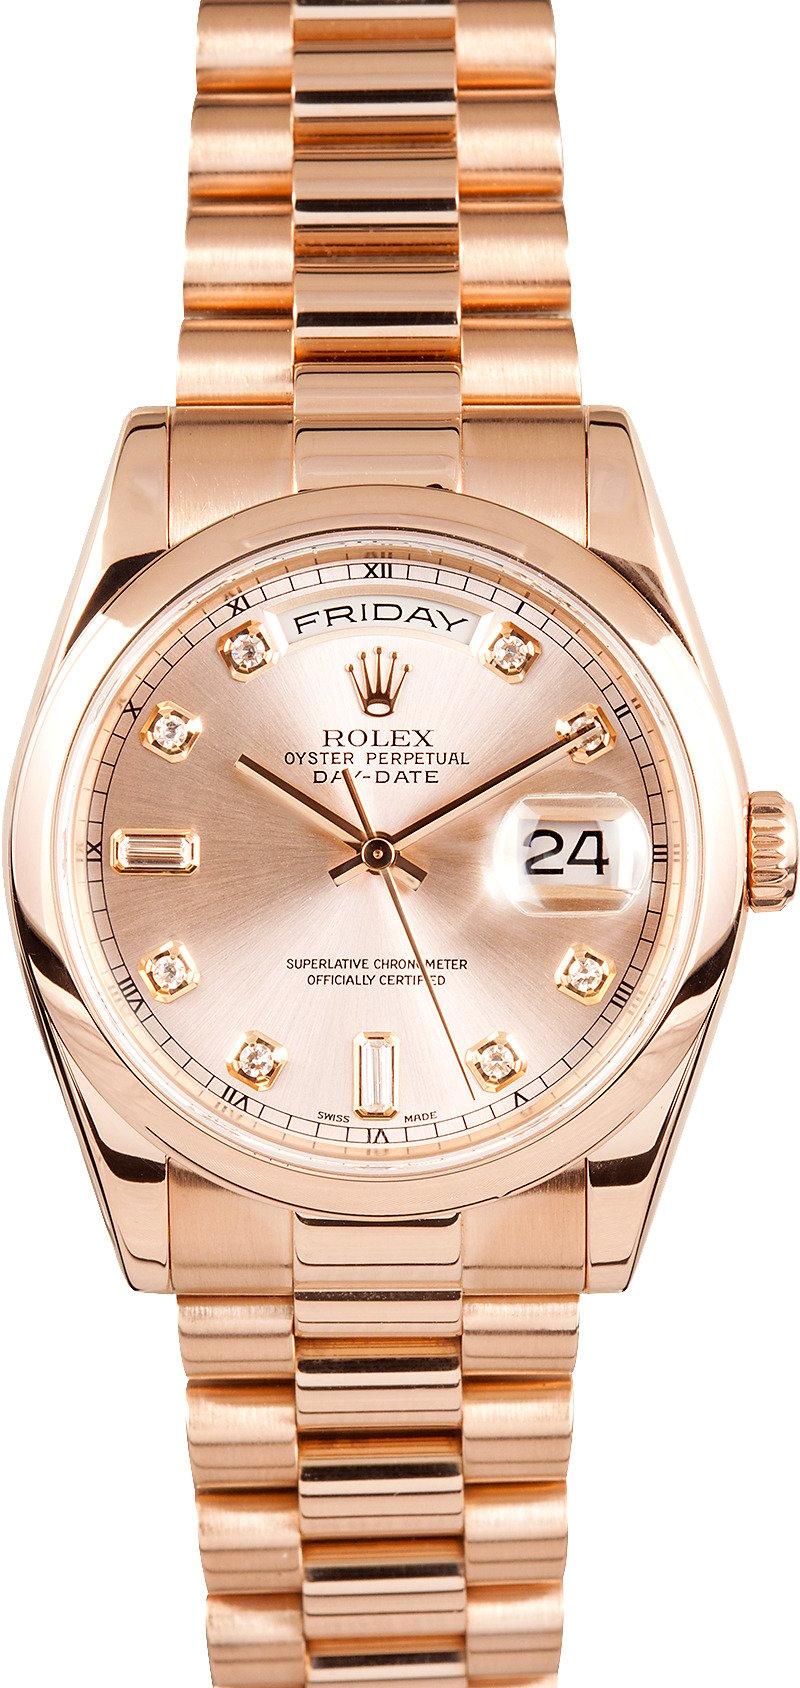 Rolex watches rose gold